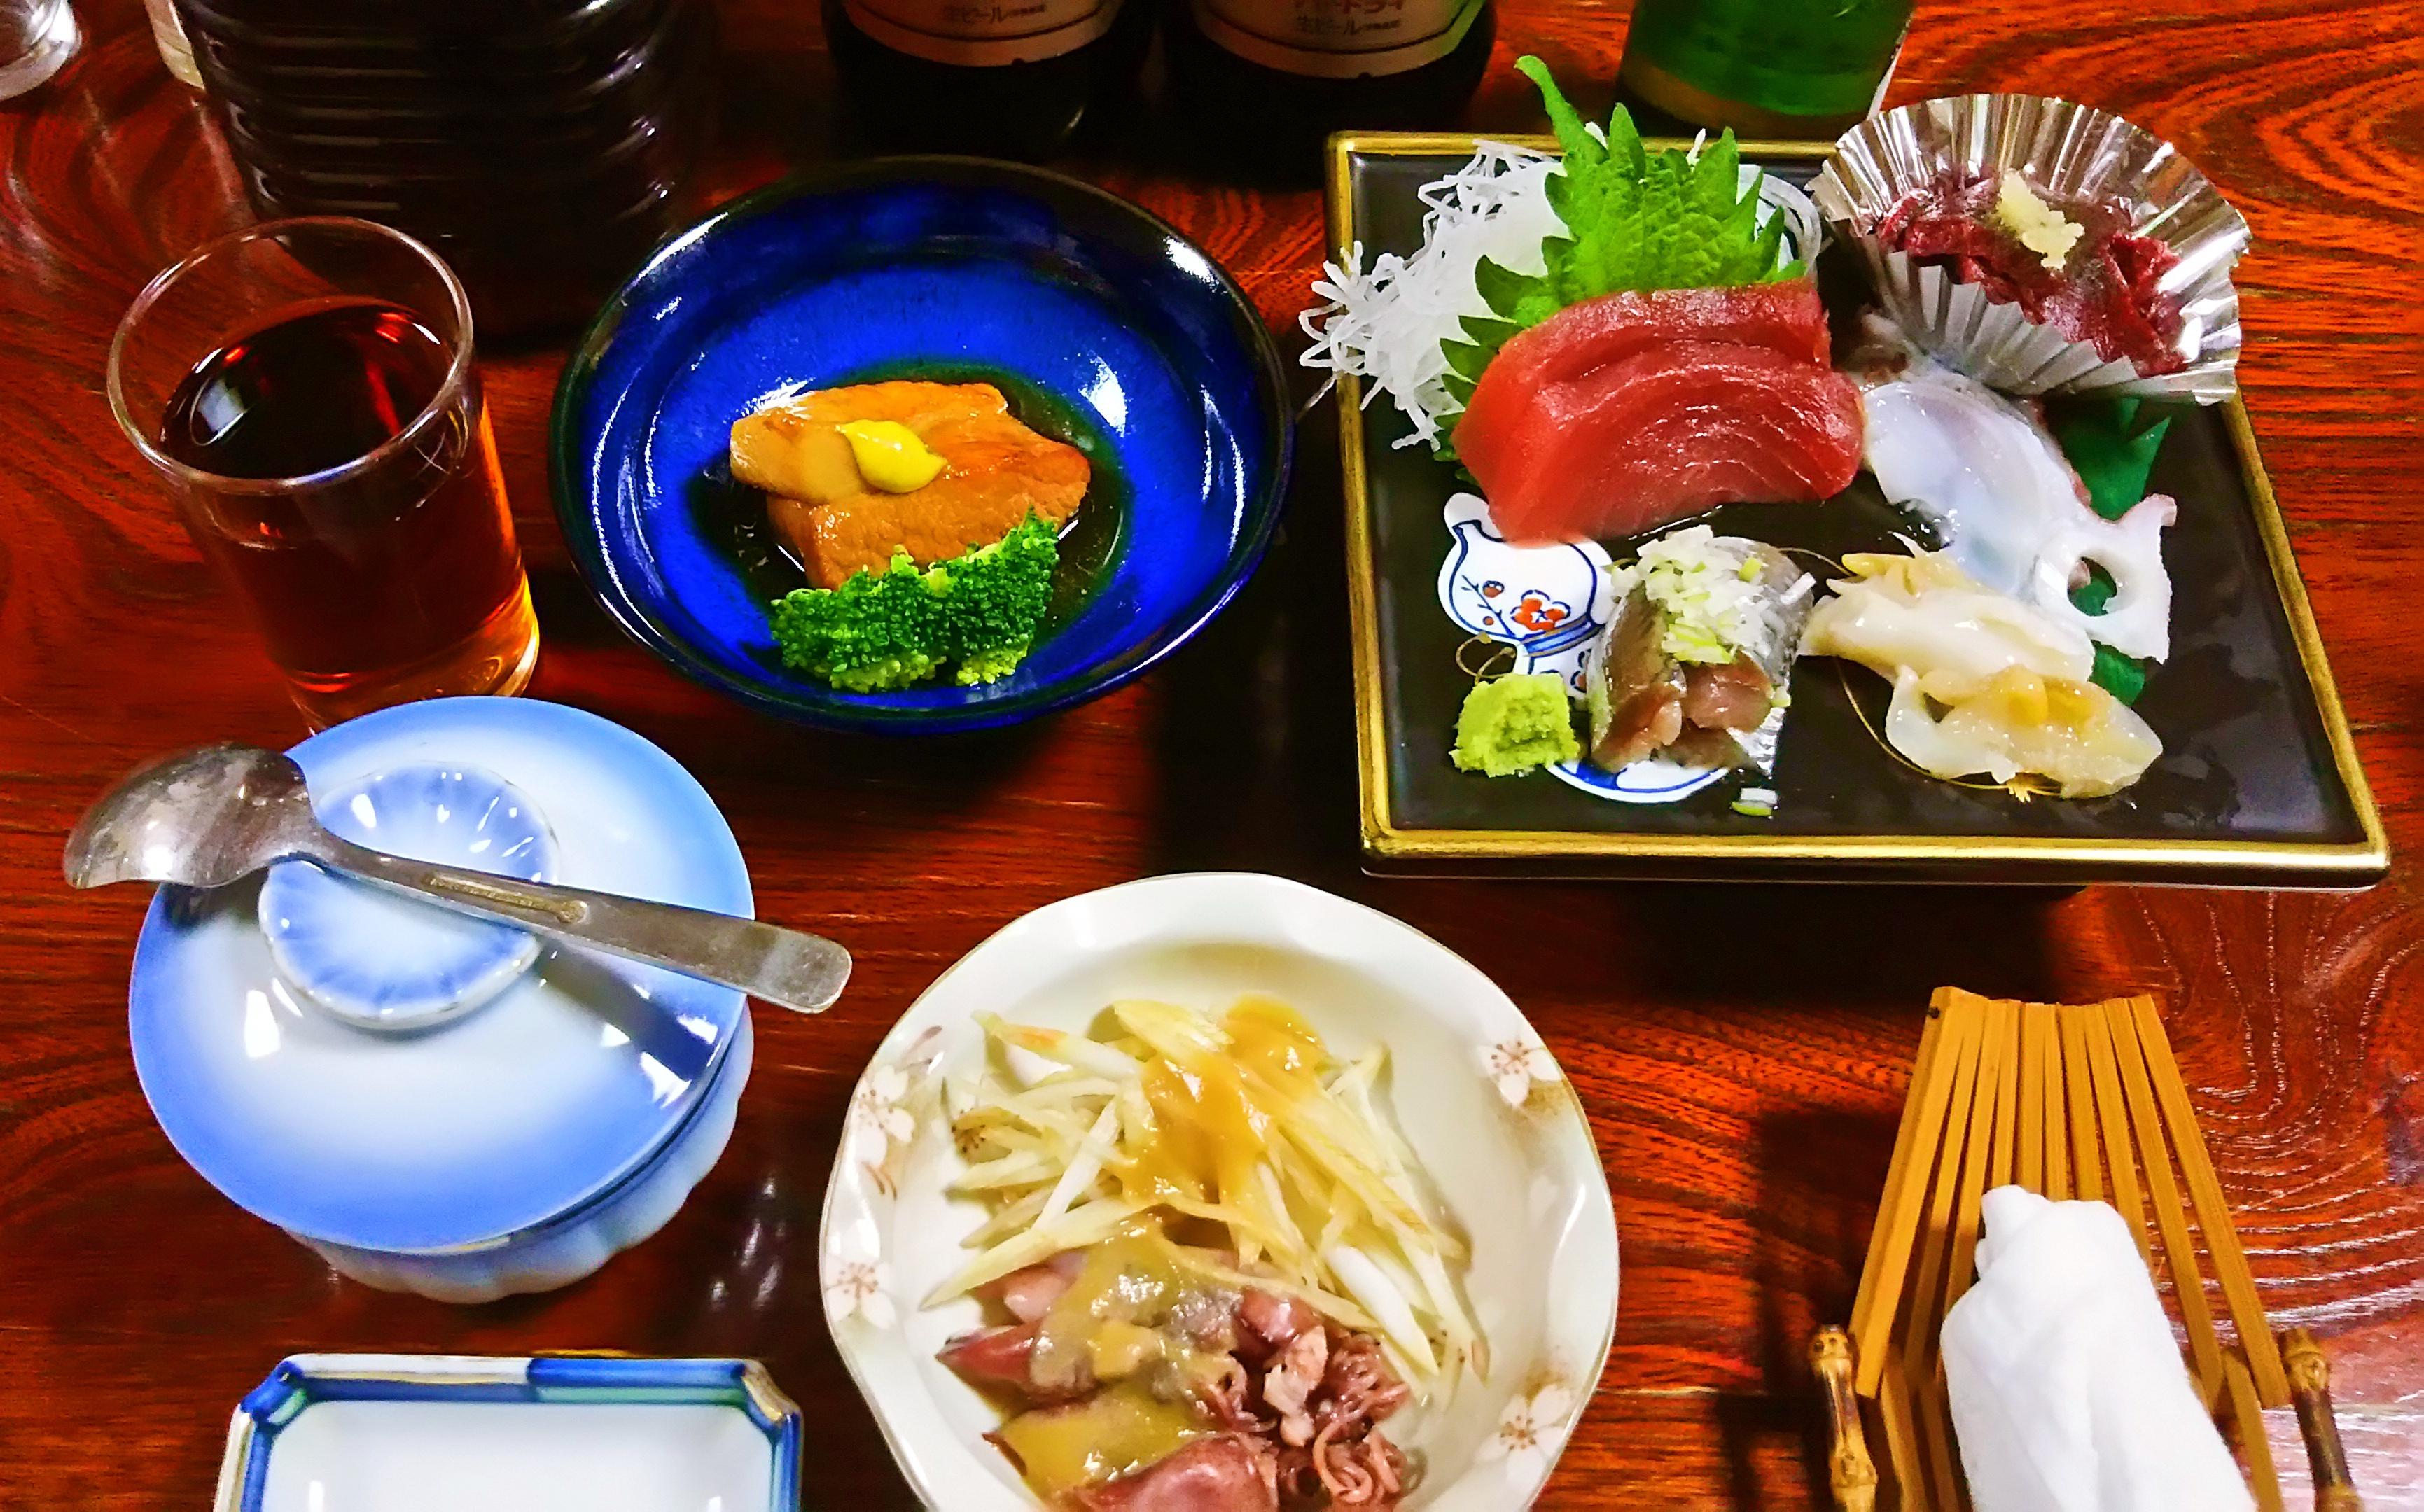 http://www.fukukomachi.com/blog/photo/C360_2017-04-05-18-50-26-753.jpg